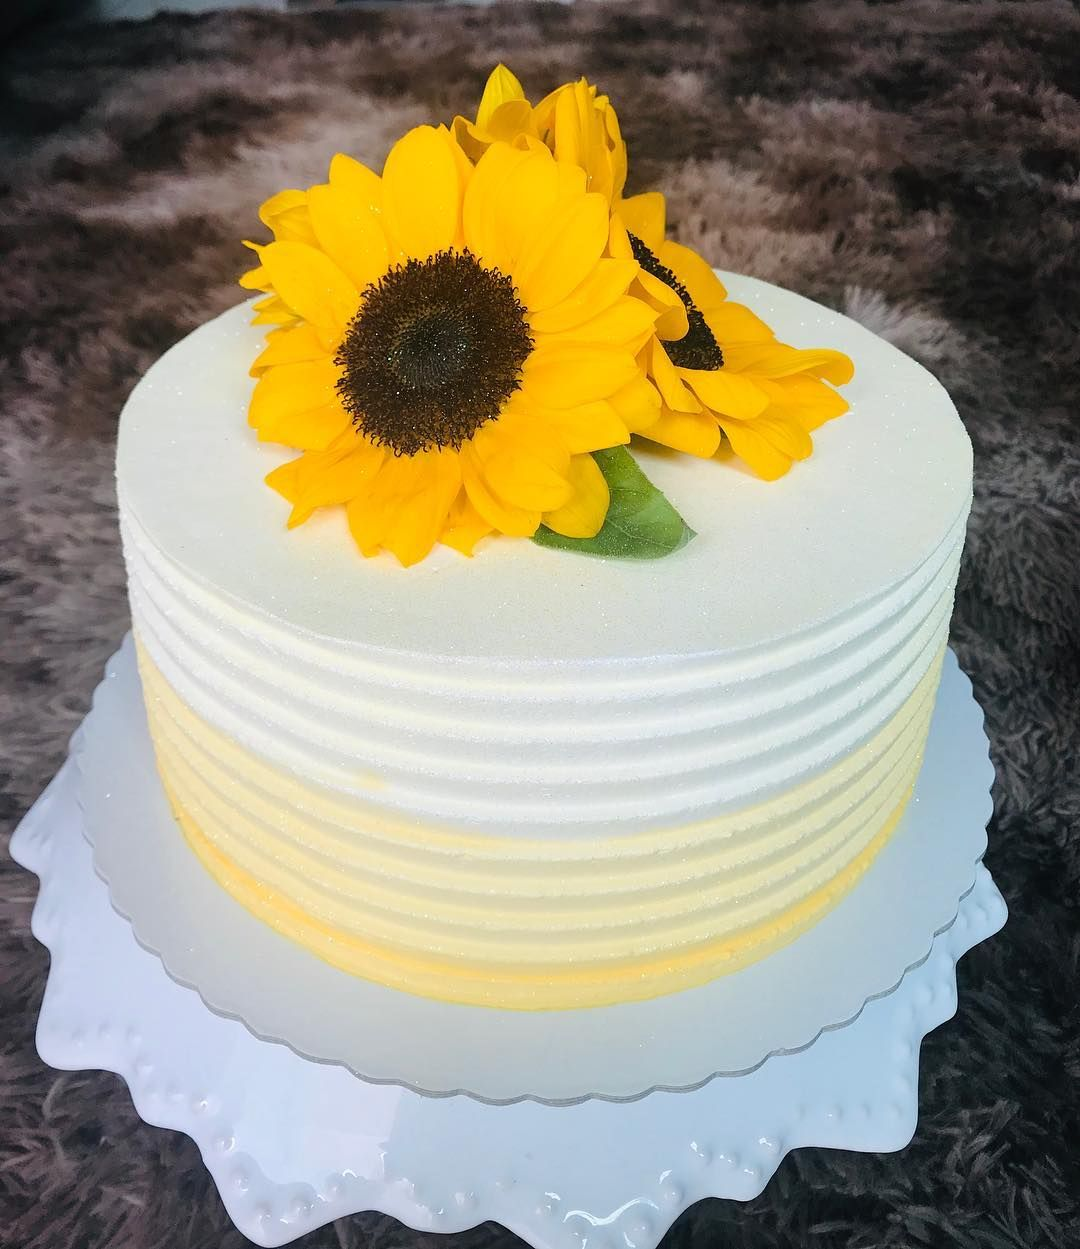 bolo de girassol simples